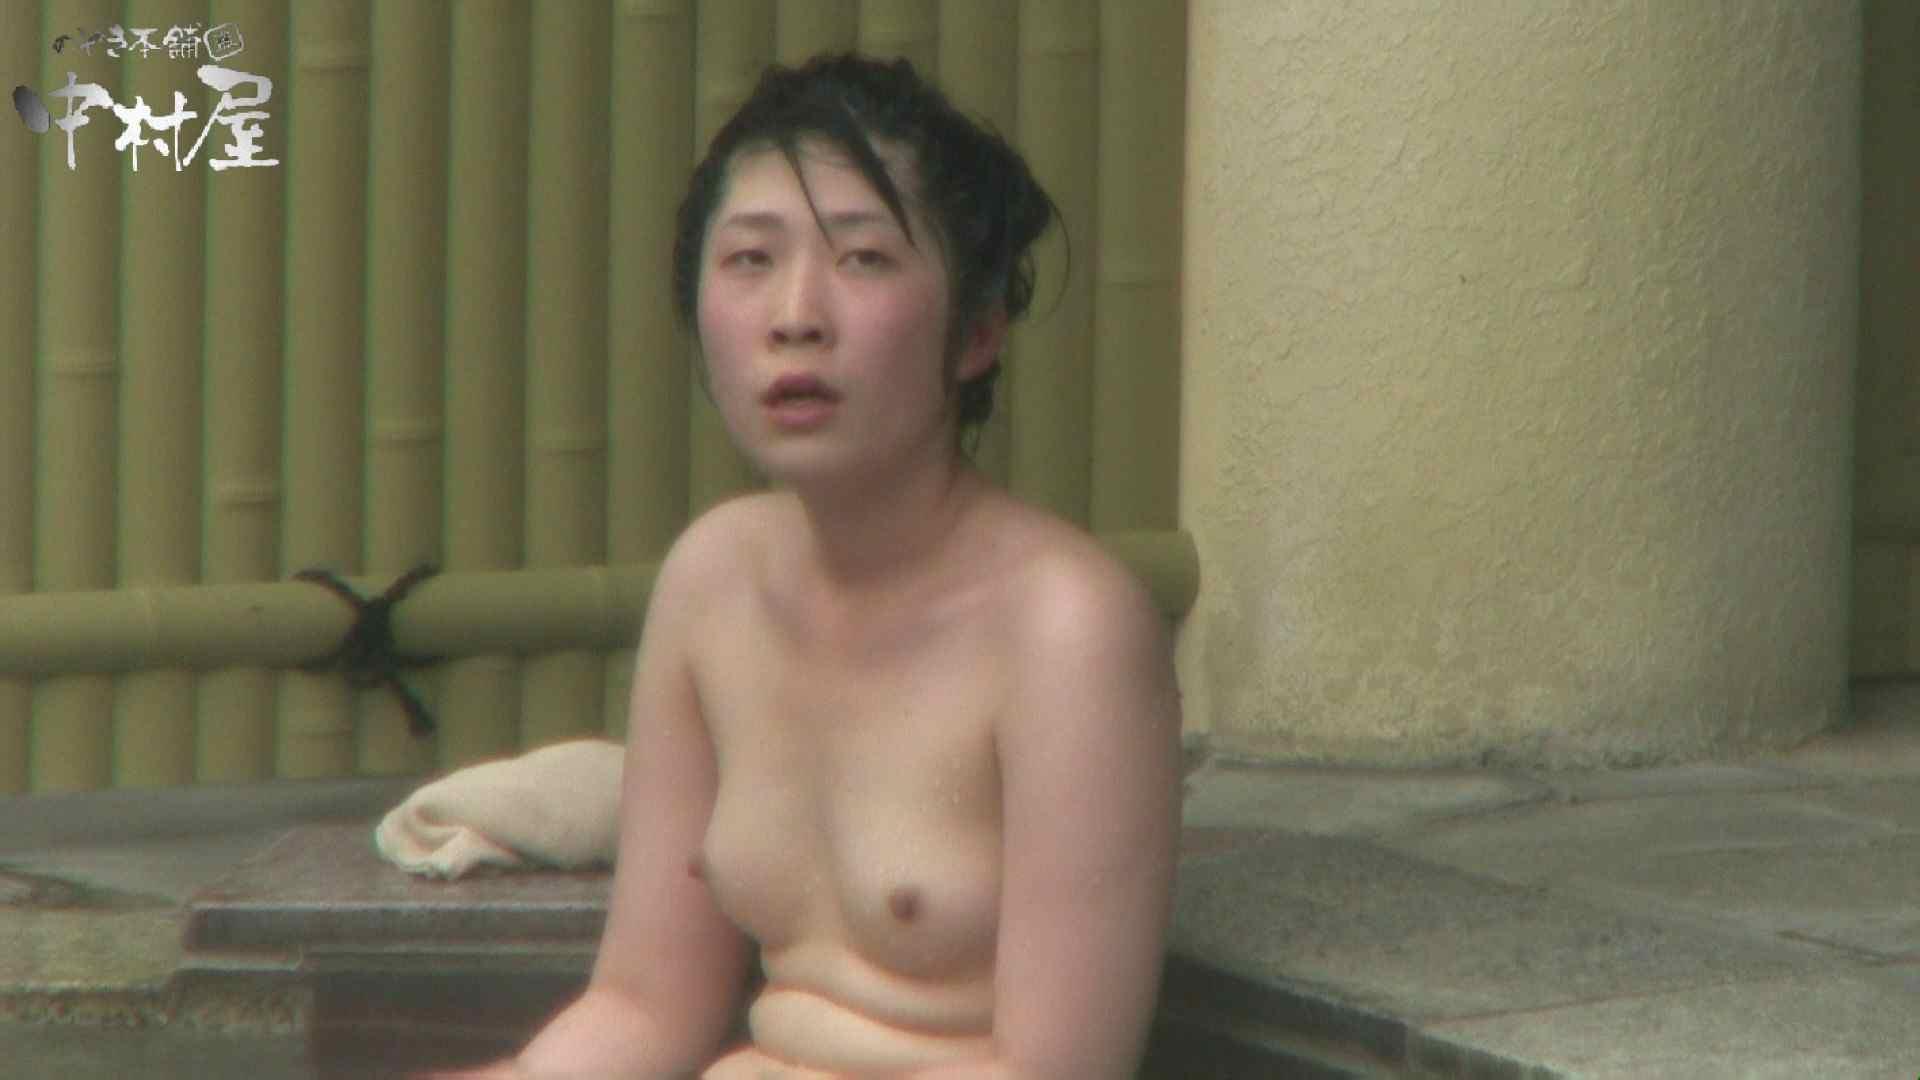 Aquaな露天風呂Vol.955 盗撮師作品  85pic 30